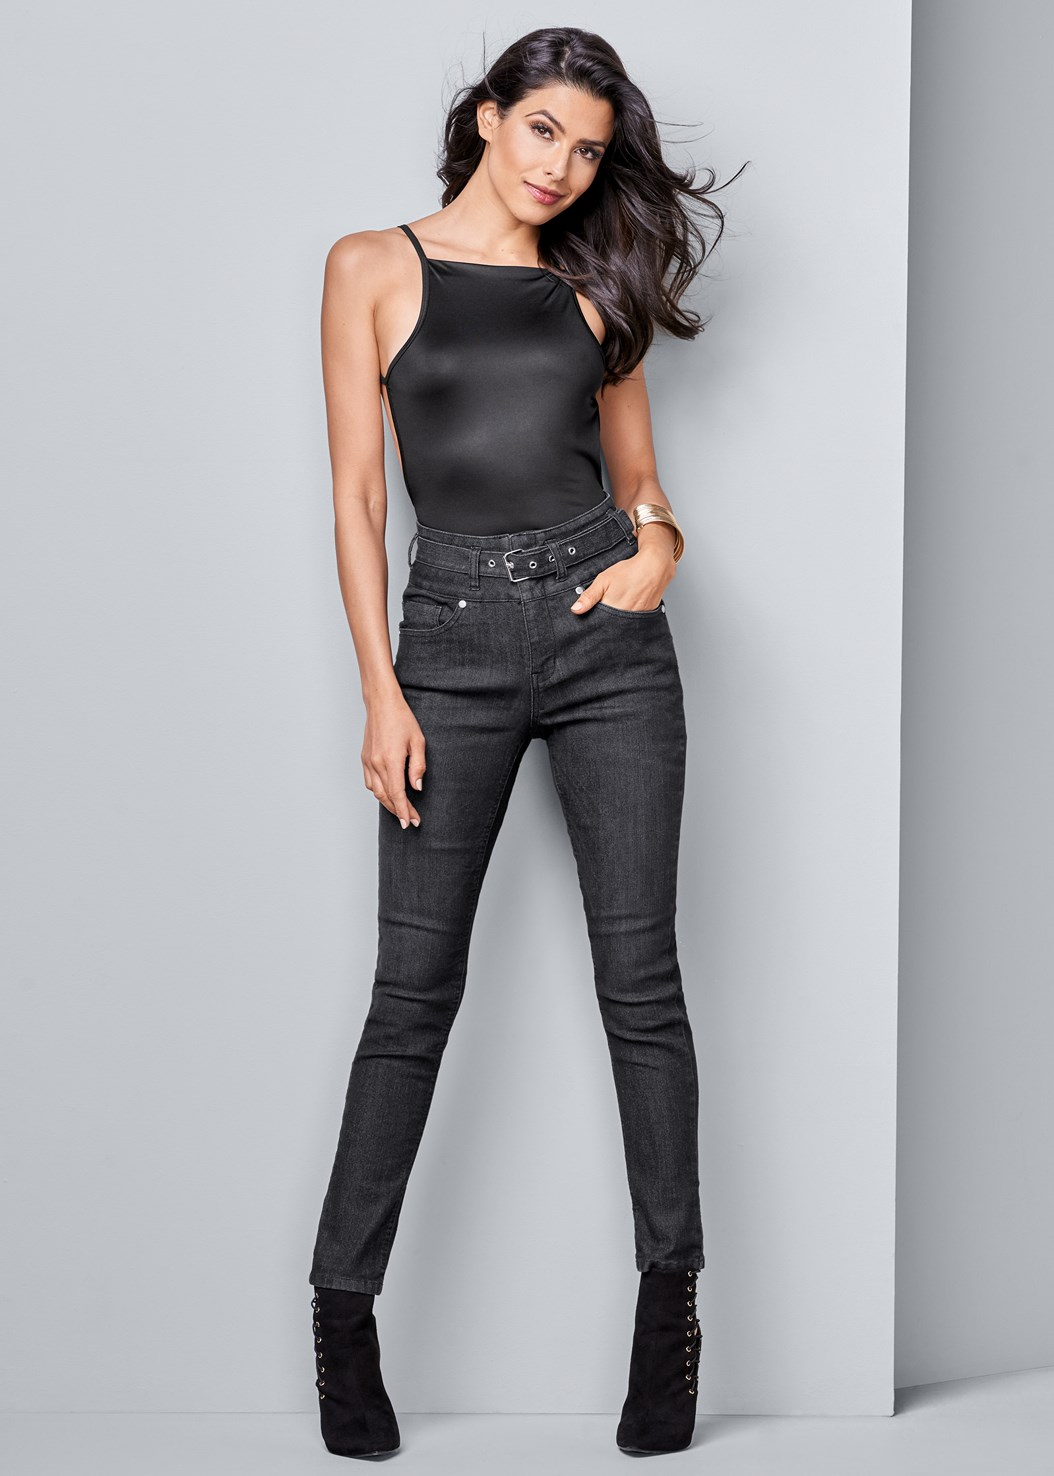 Belted High Waist Jeans